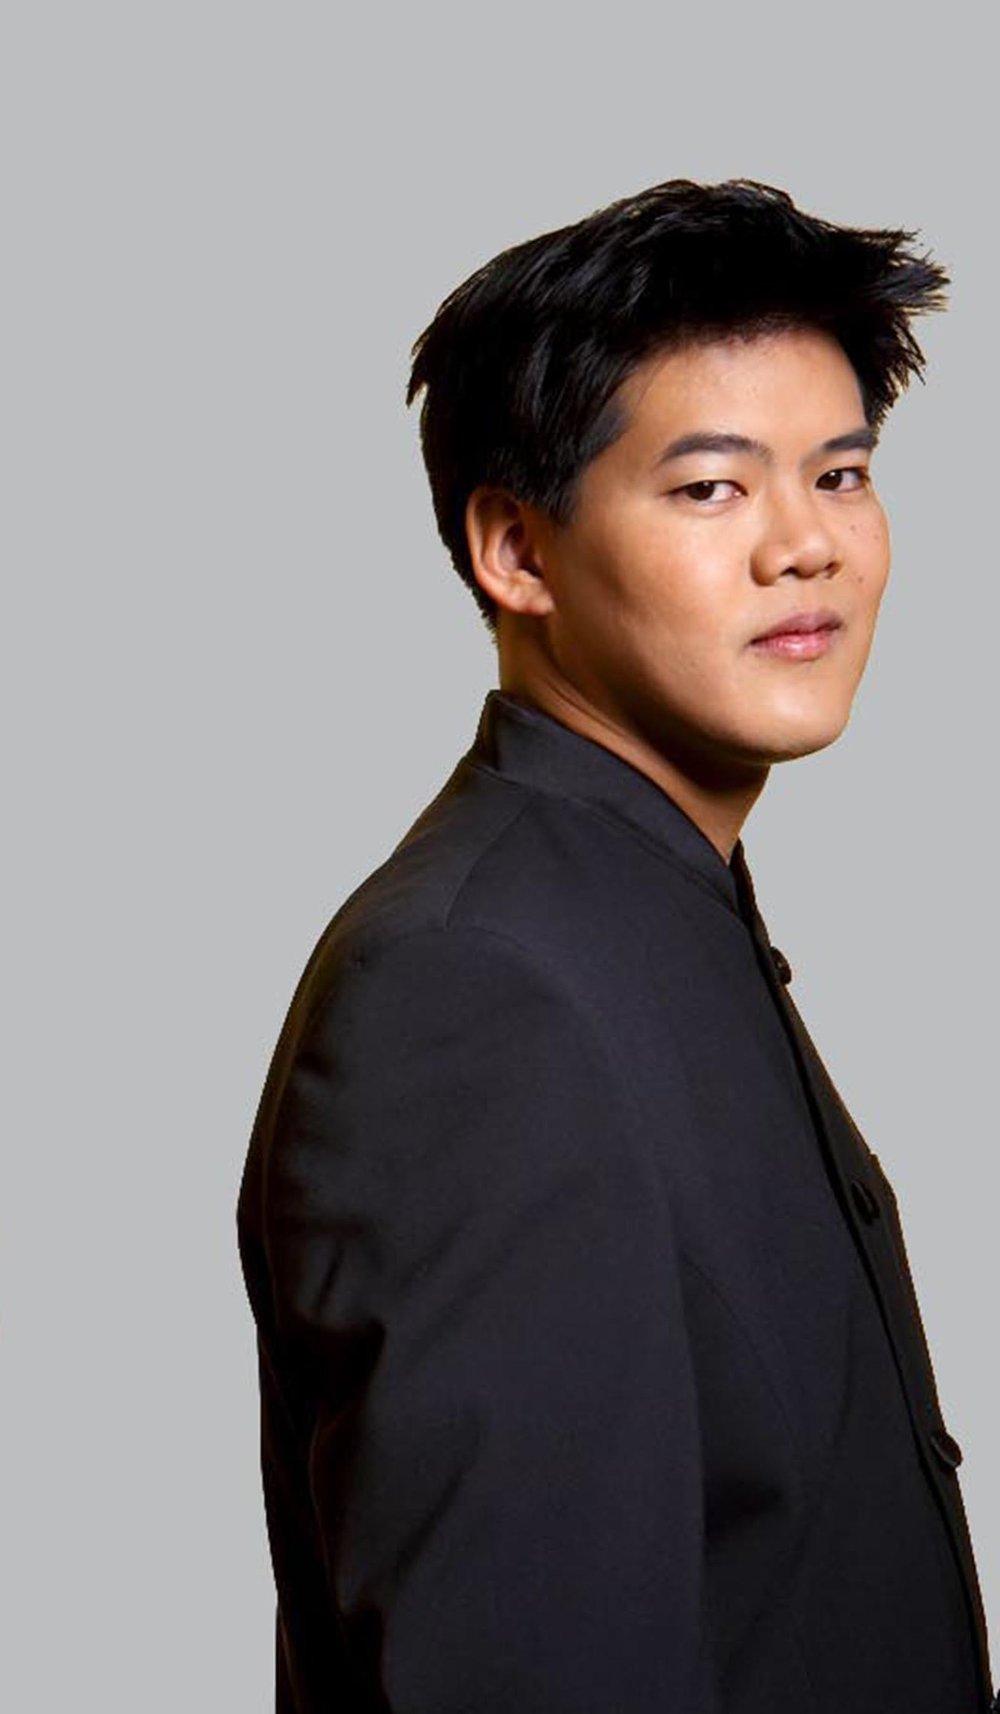 primary-Piano-Recital-Winston-Choi-1466960170.jpeg